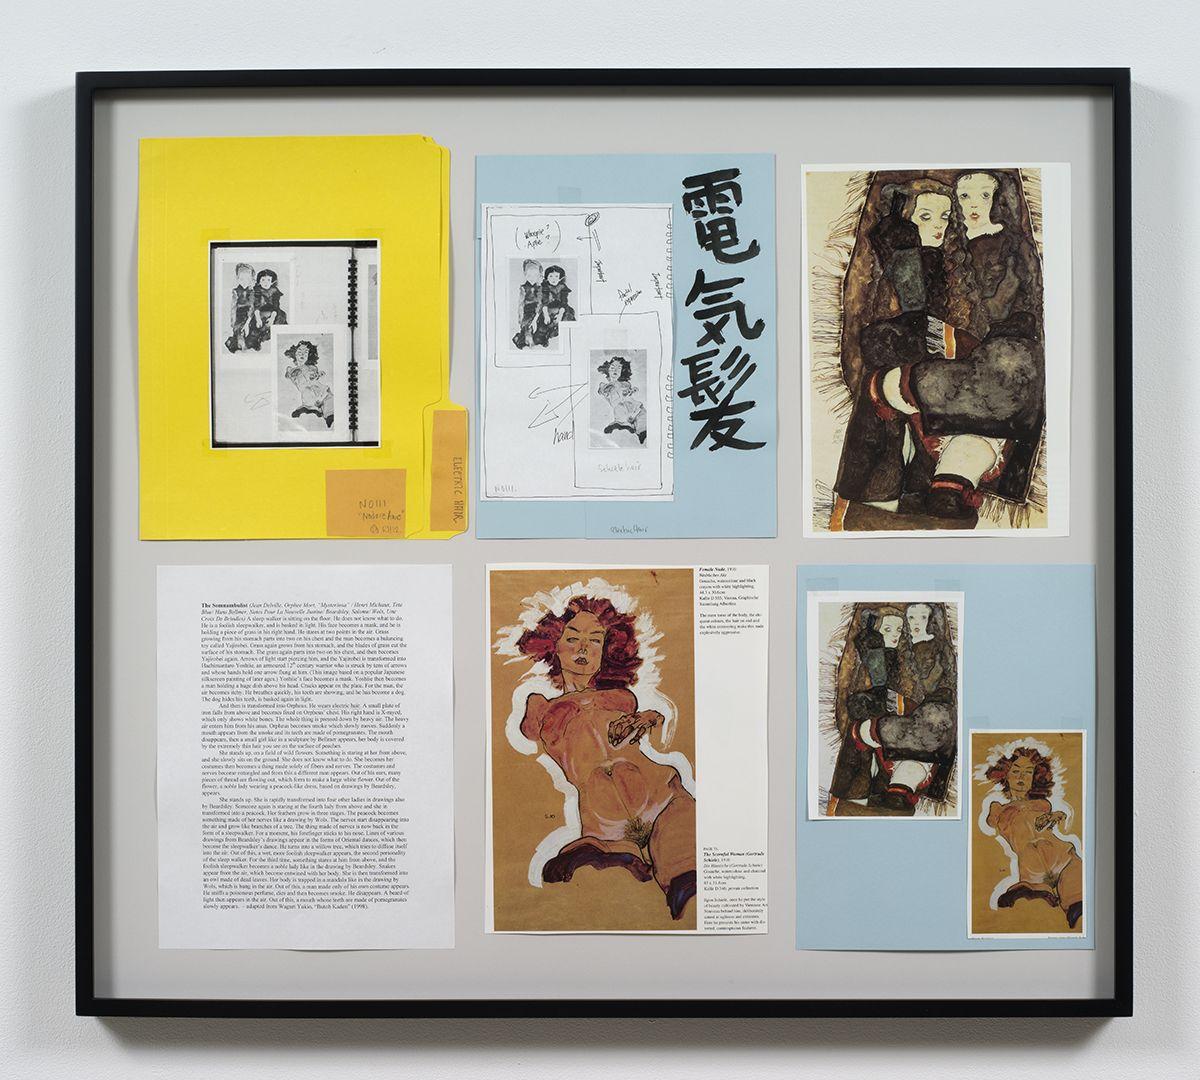 Ankoku 27 (Resource folder: Electric hair), 2012, Collage, 27 x 30 1/8 x 1 1/2 inches (68.6 x 76.5 x 3.8 cm)